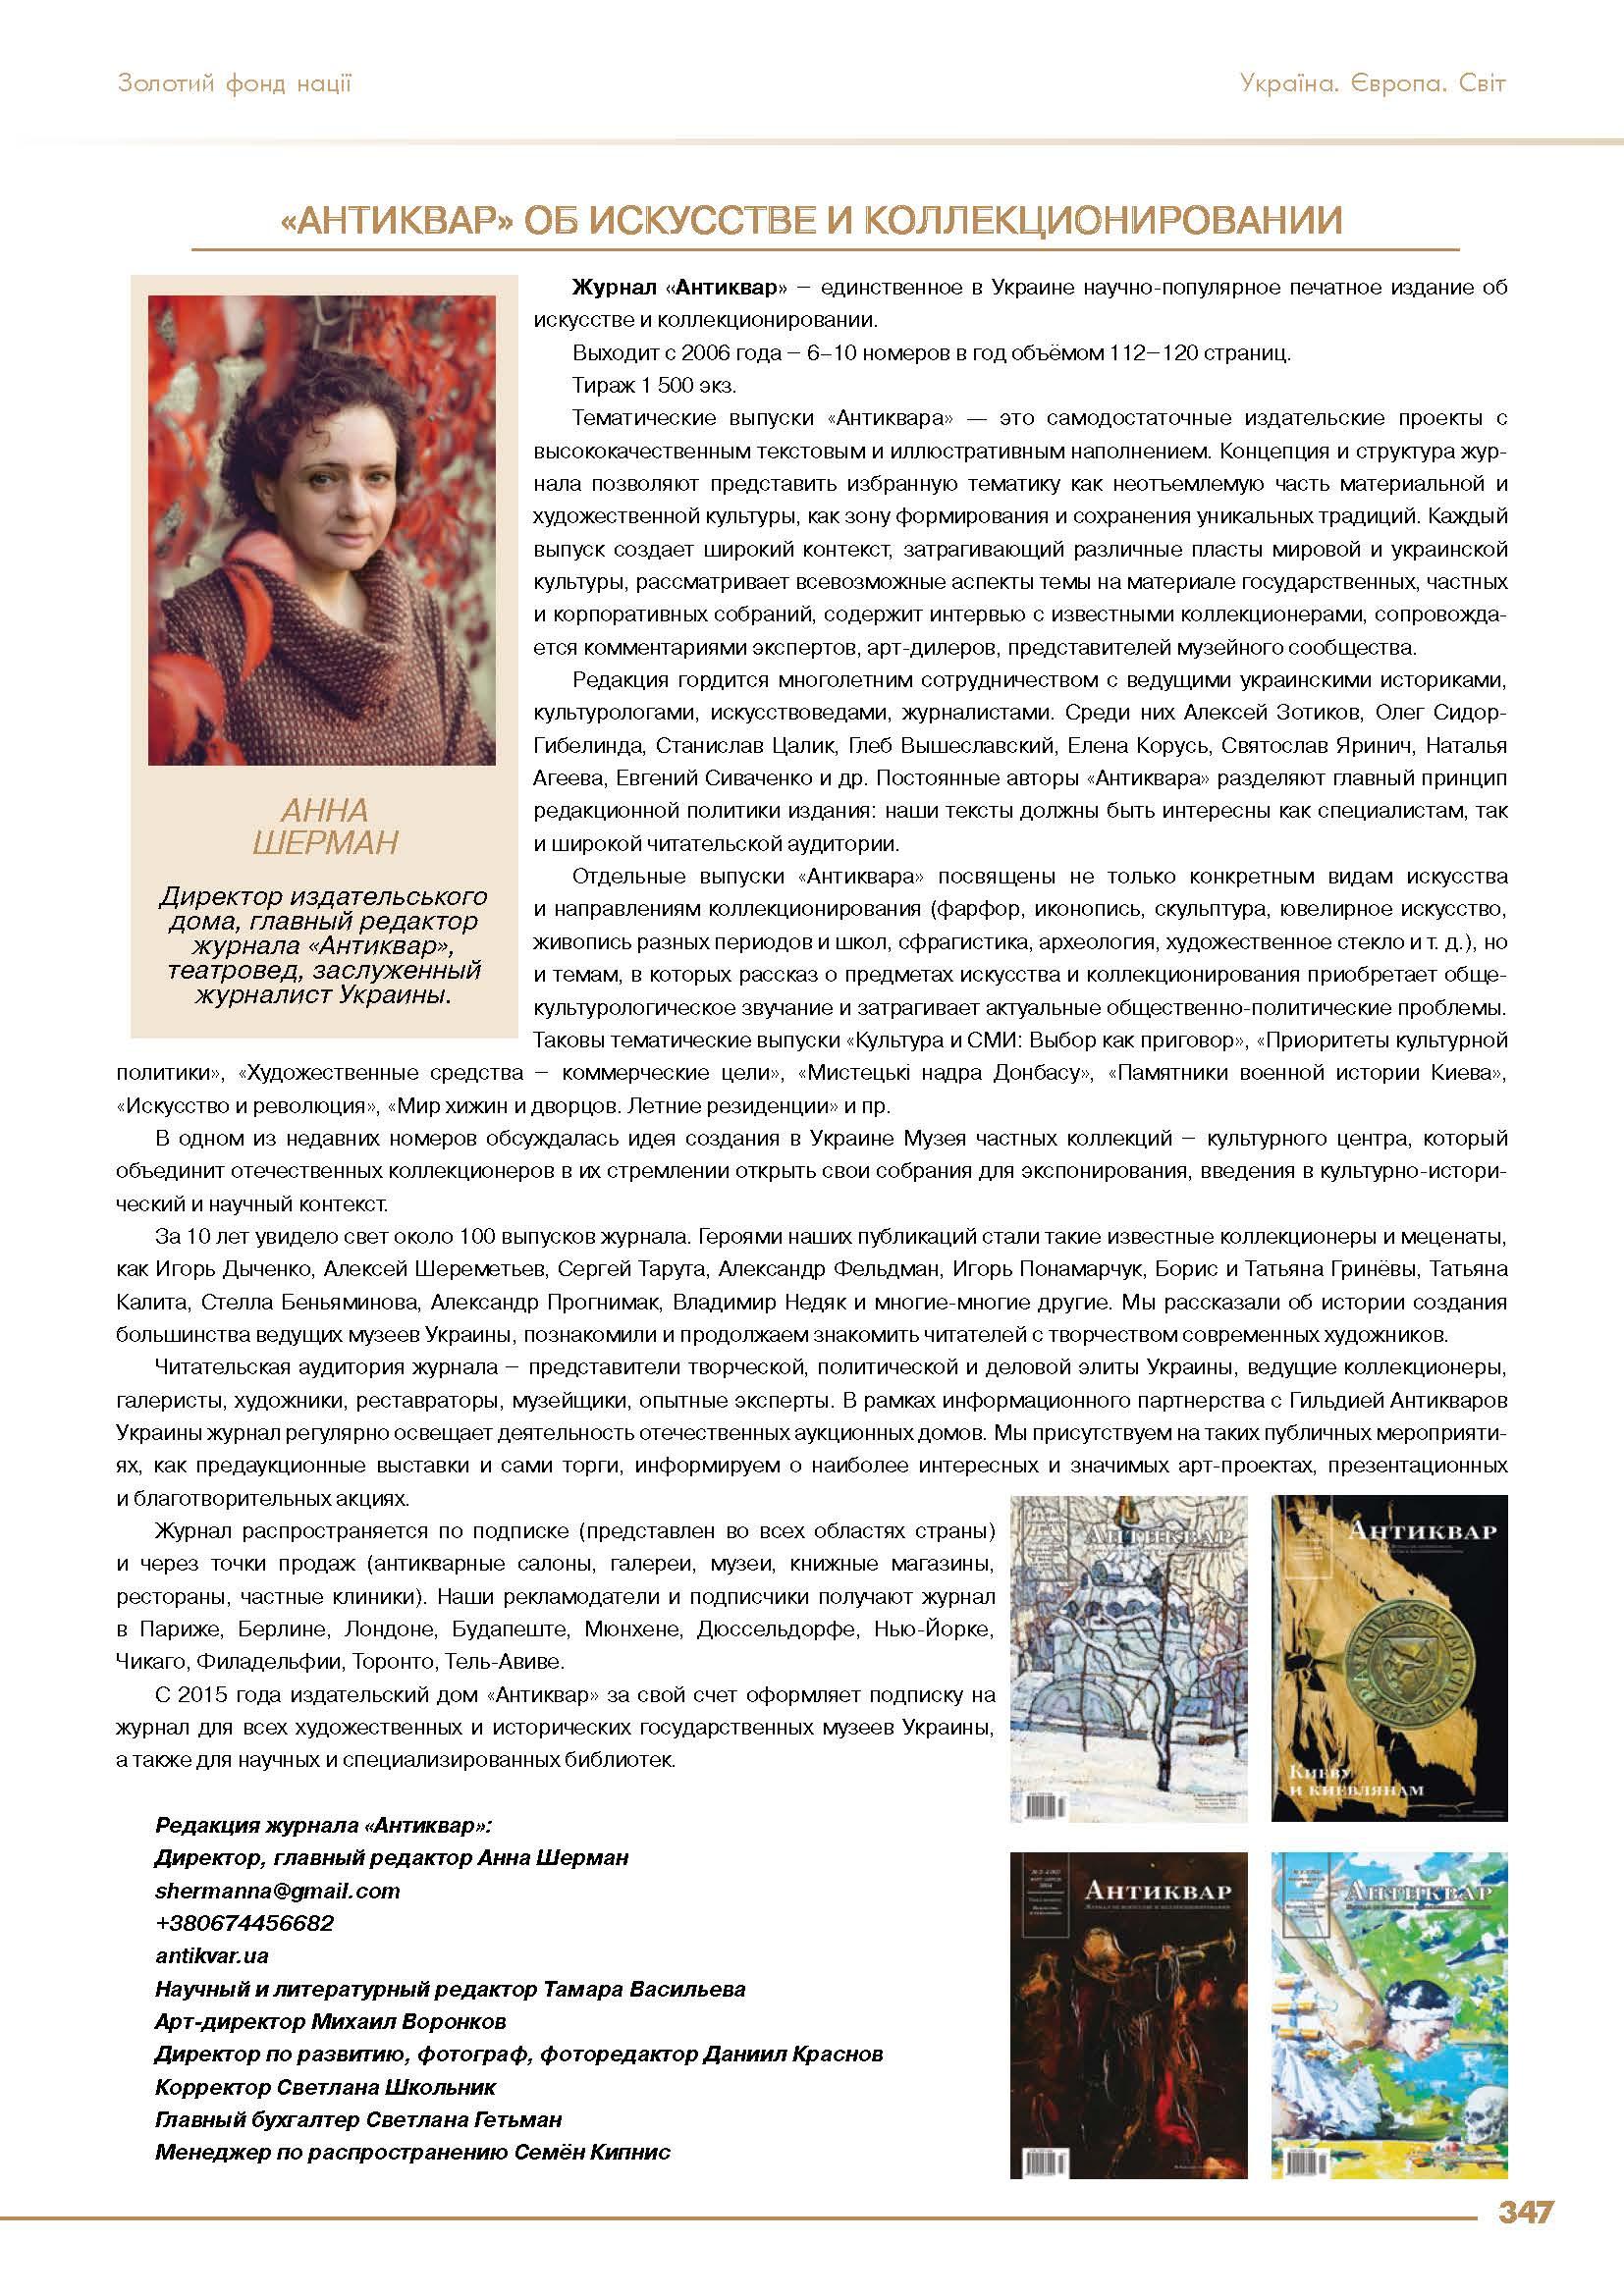 Журнал «Антиквар» - директор Анна Шерман